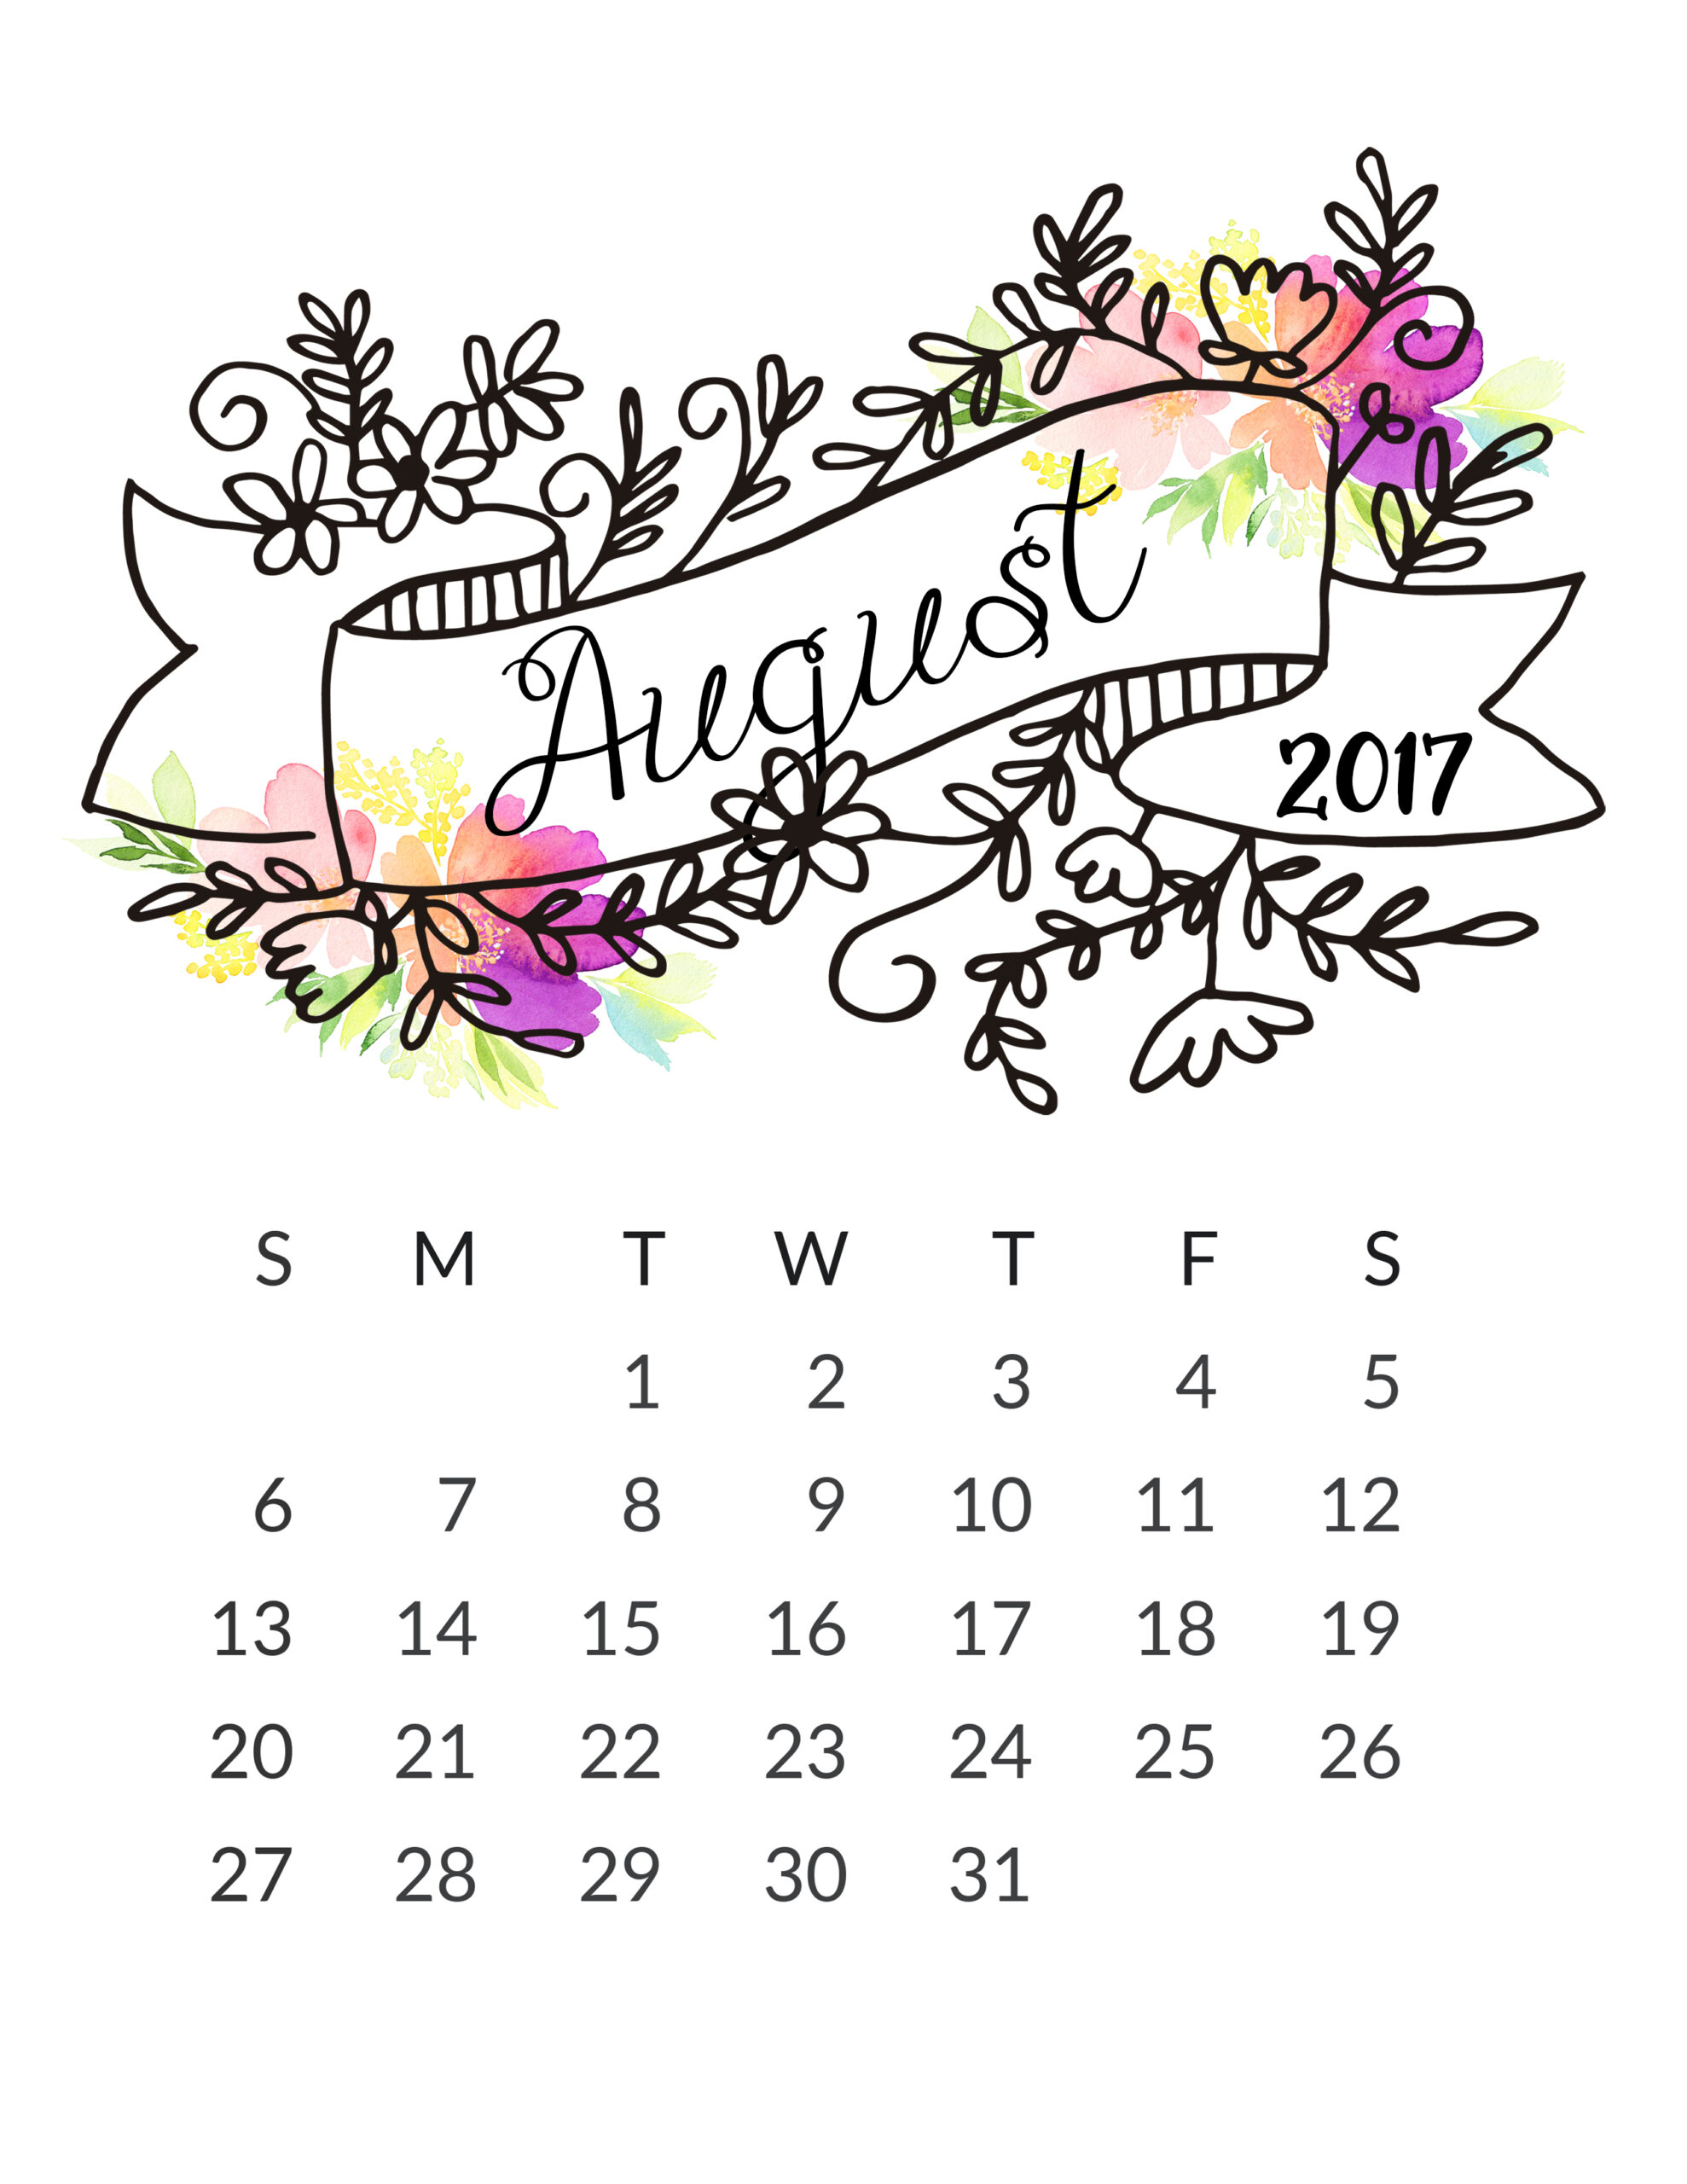 Free 2017 Printable Calendar! - Free Pretty Things For You